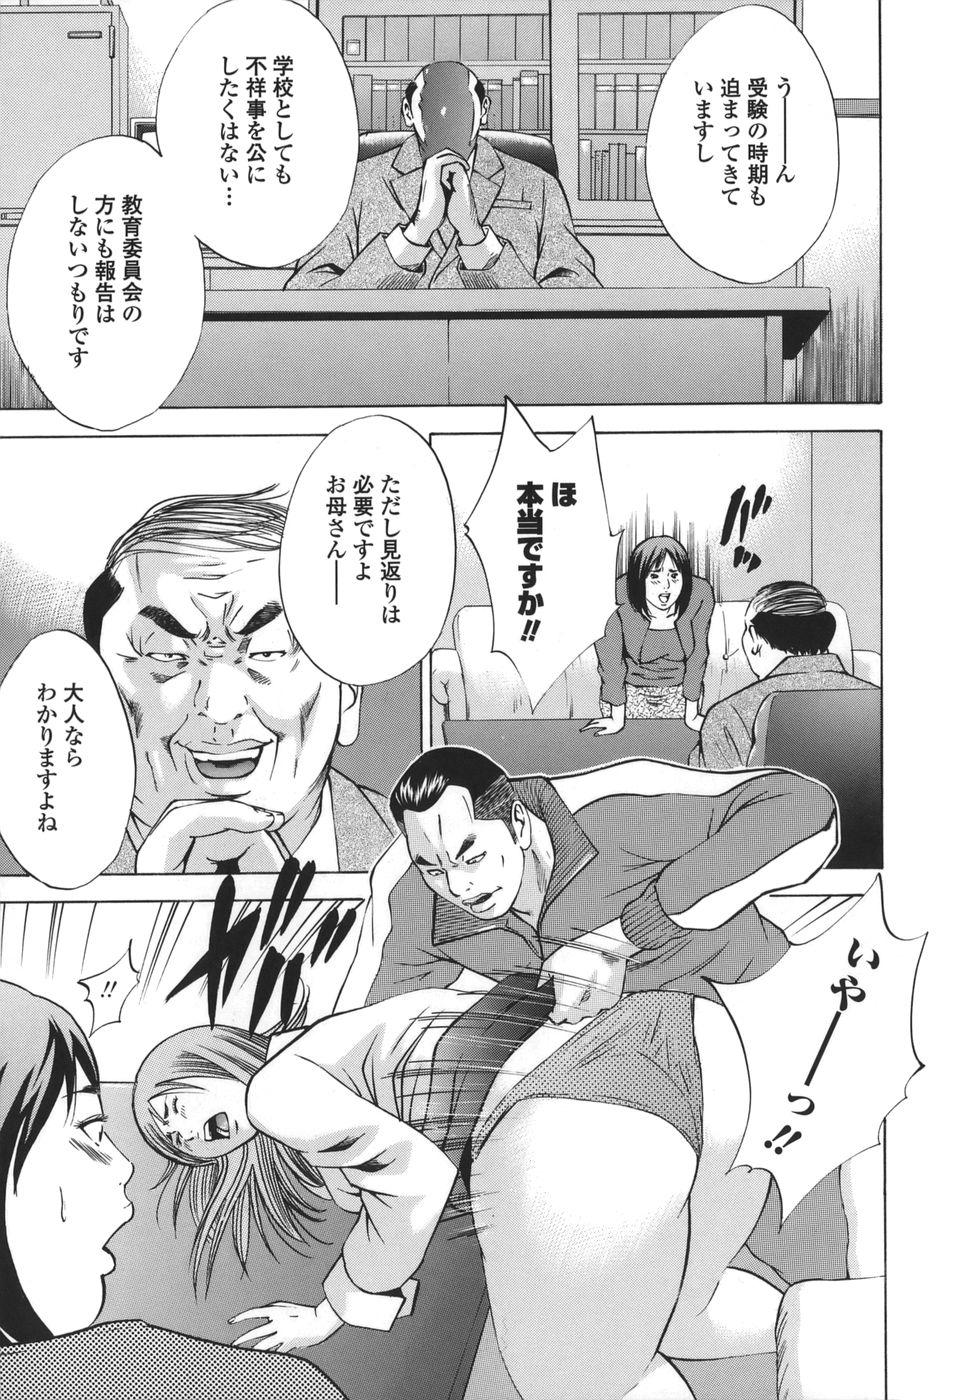 Kinshin Goukan - Near Relation Rapes 188